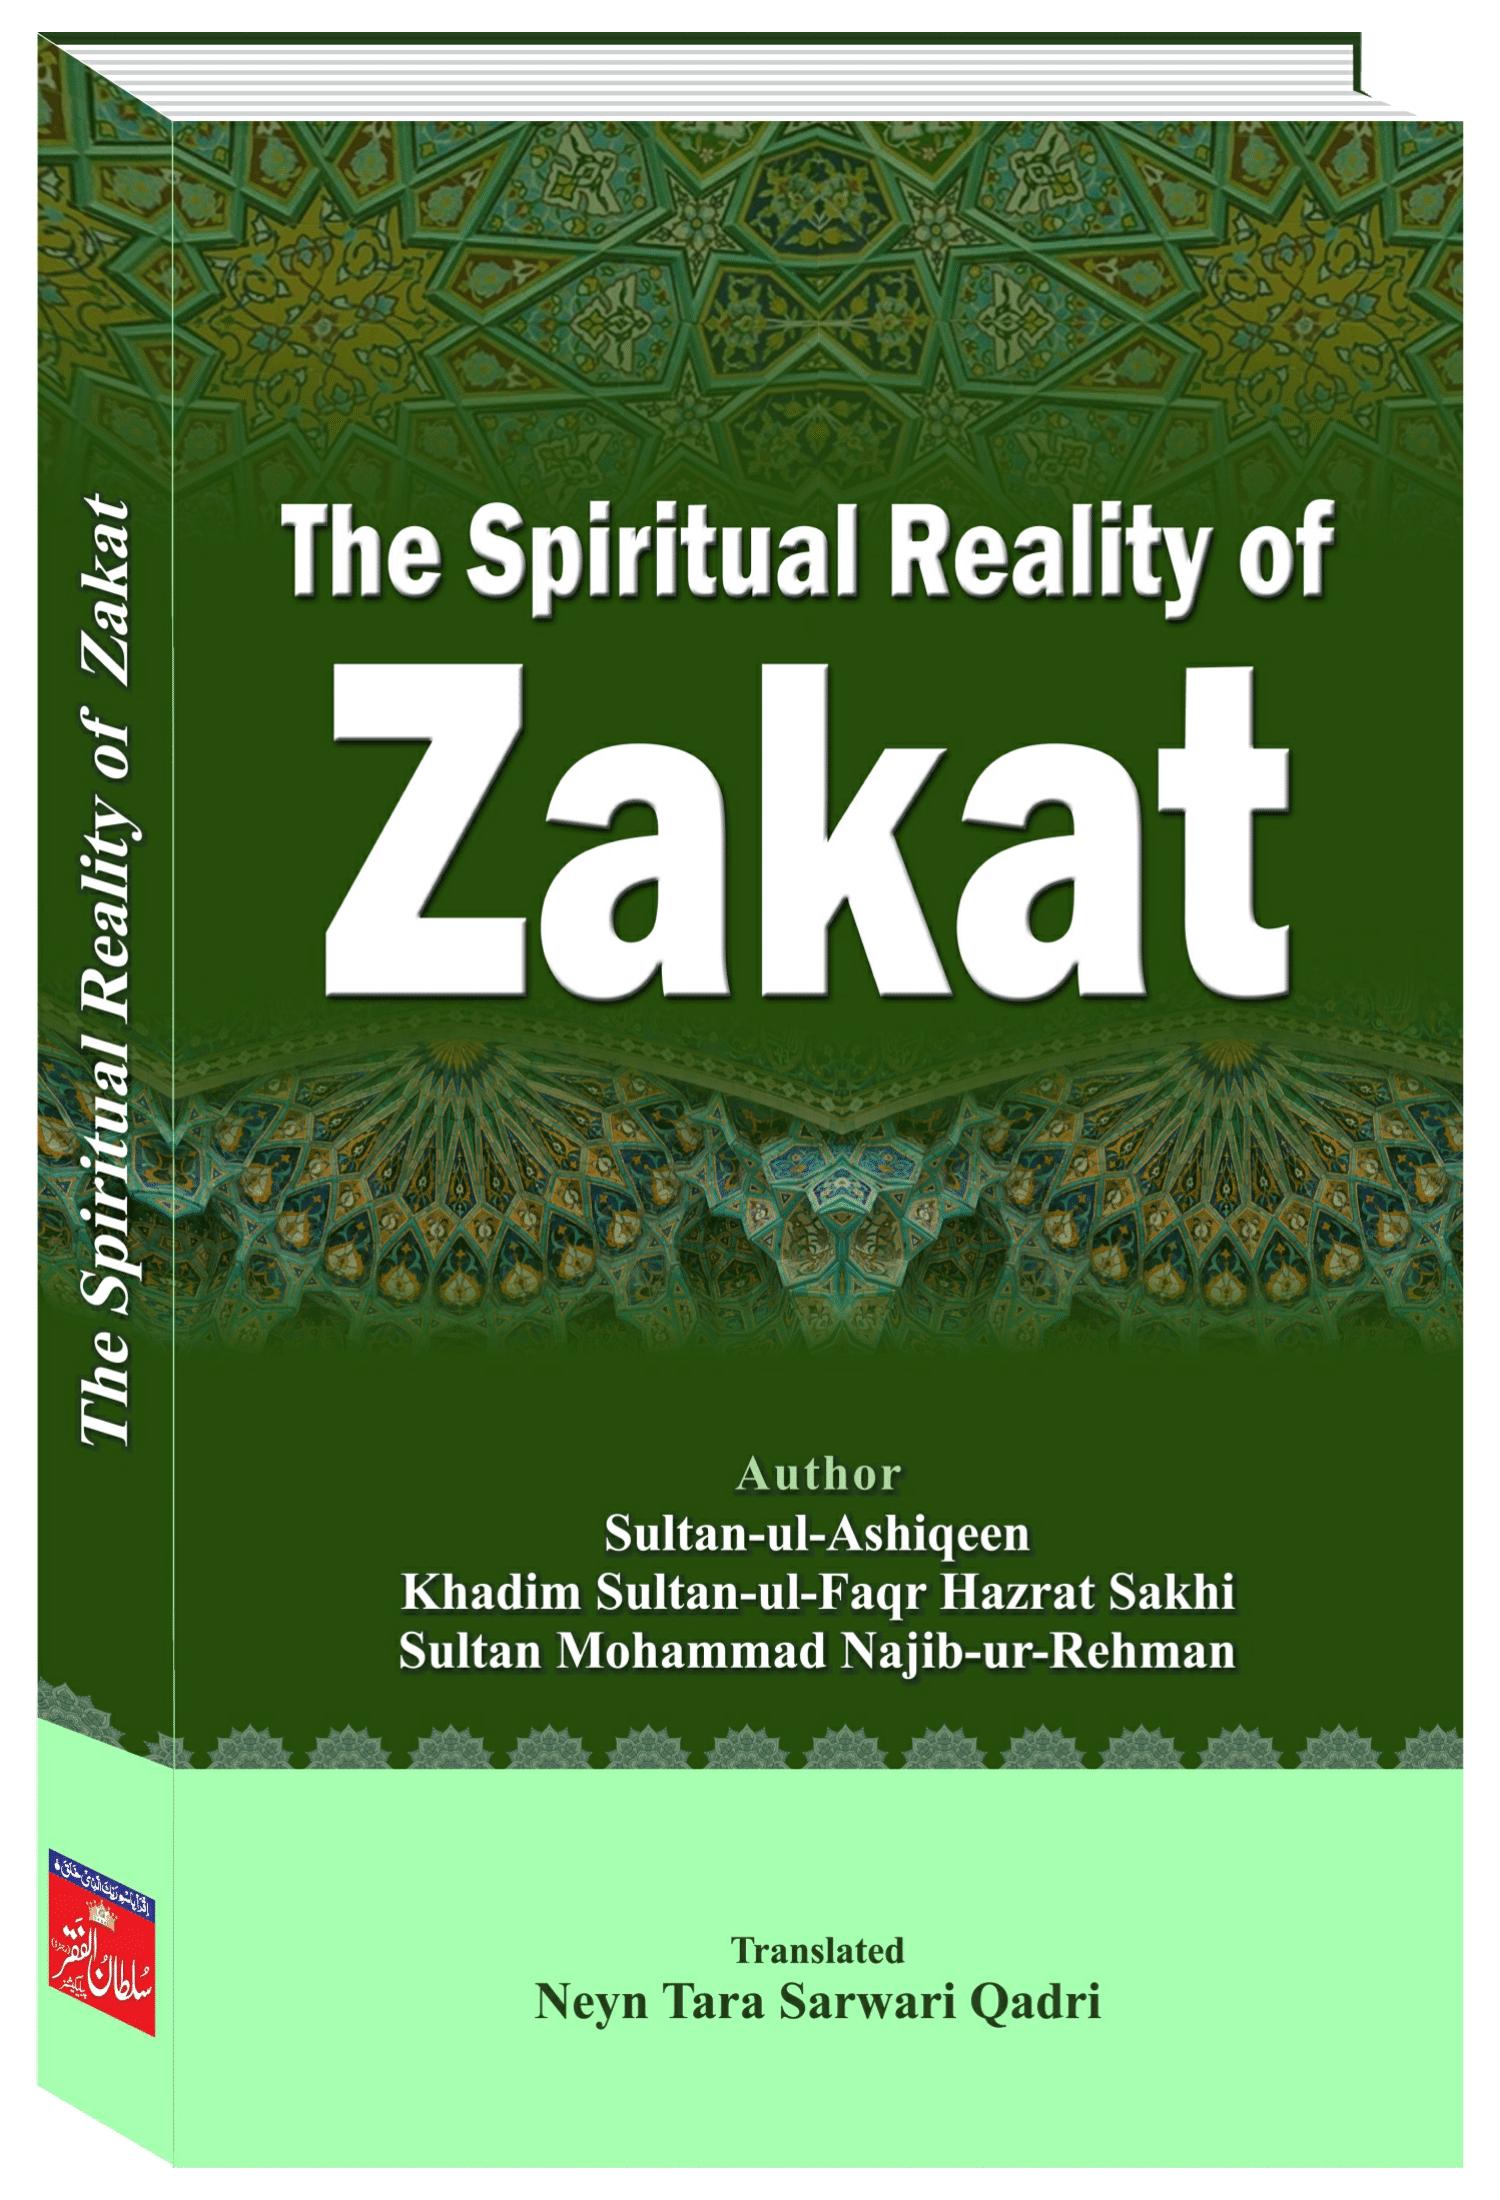 The-Spiritual-Reality-of-Zakat